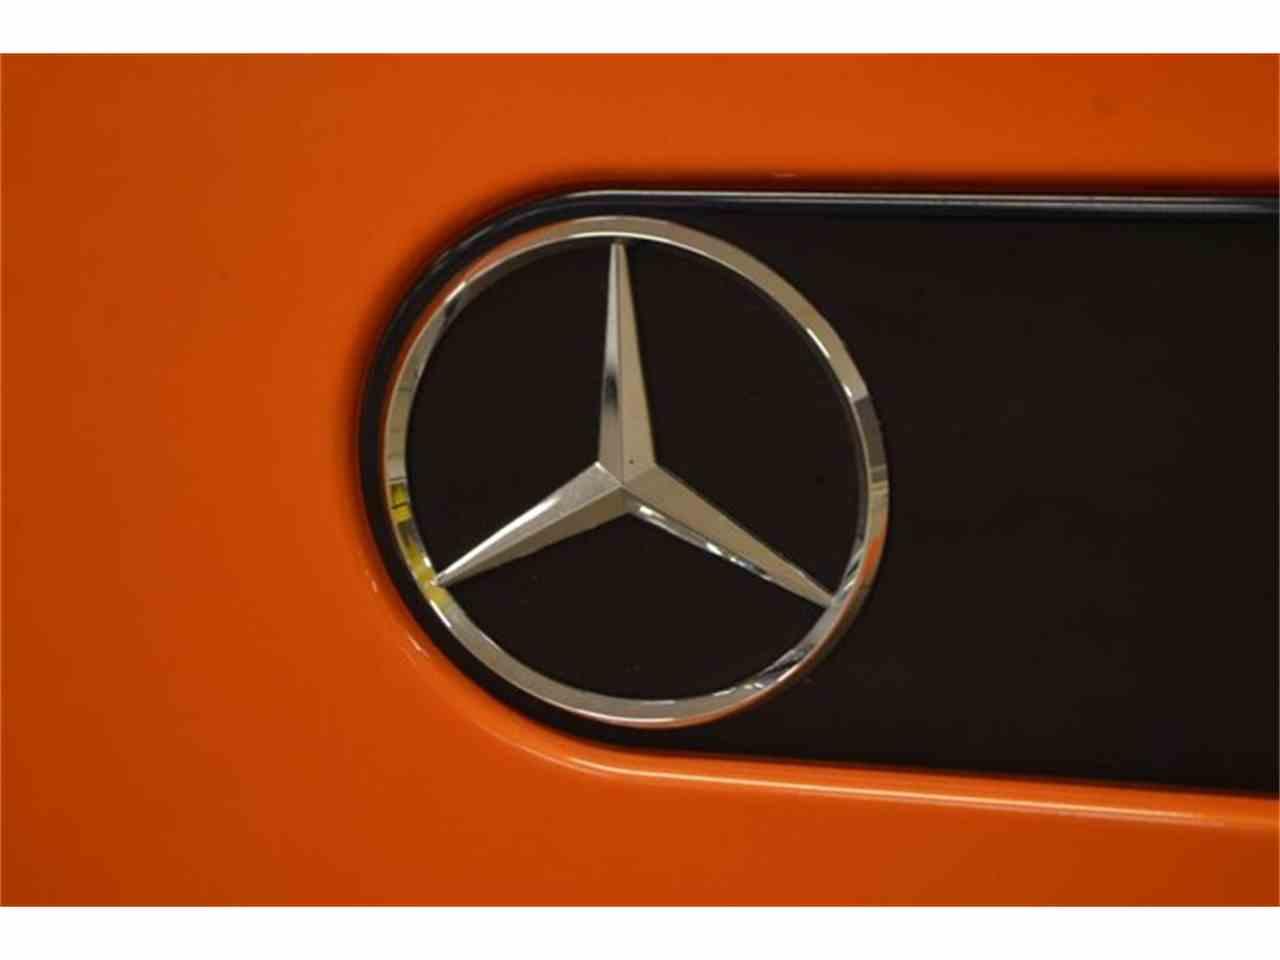 2016 Mercedes Benz G Class For Sale Classiccars Com Cc